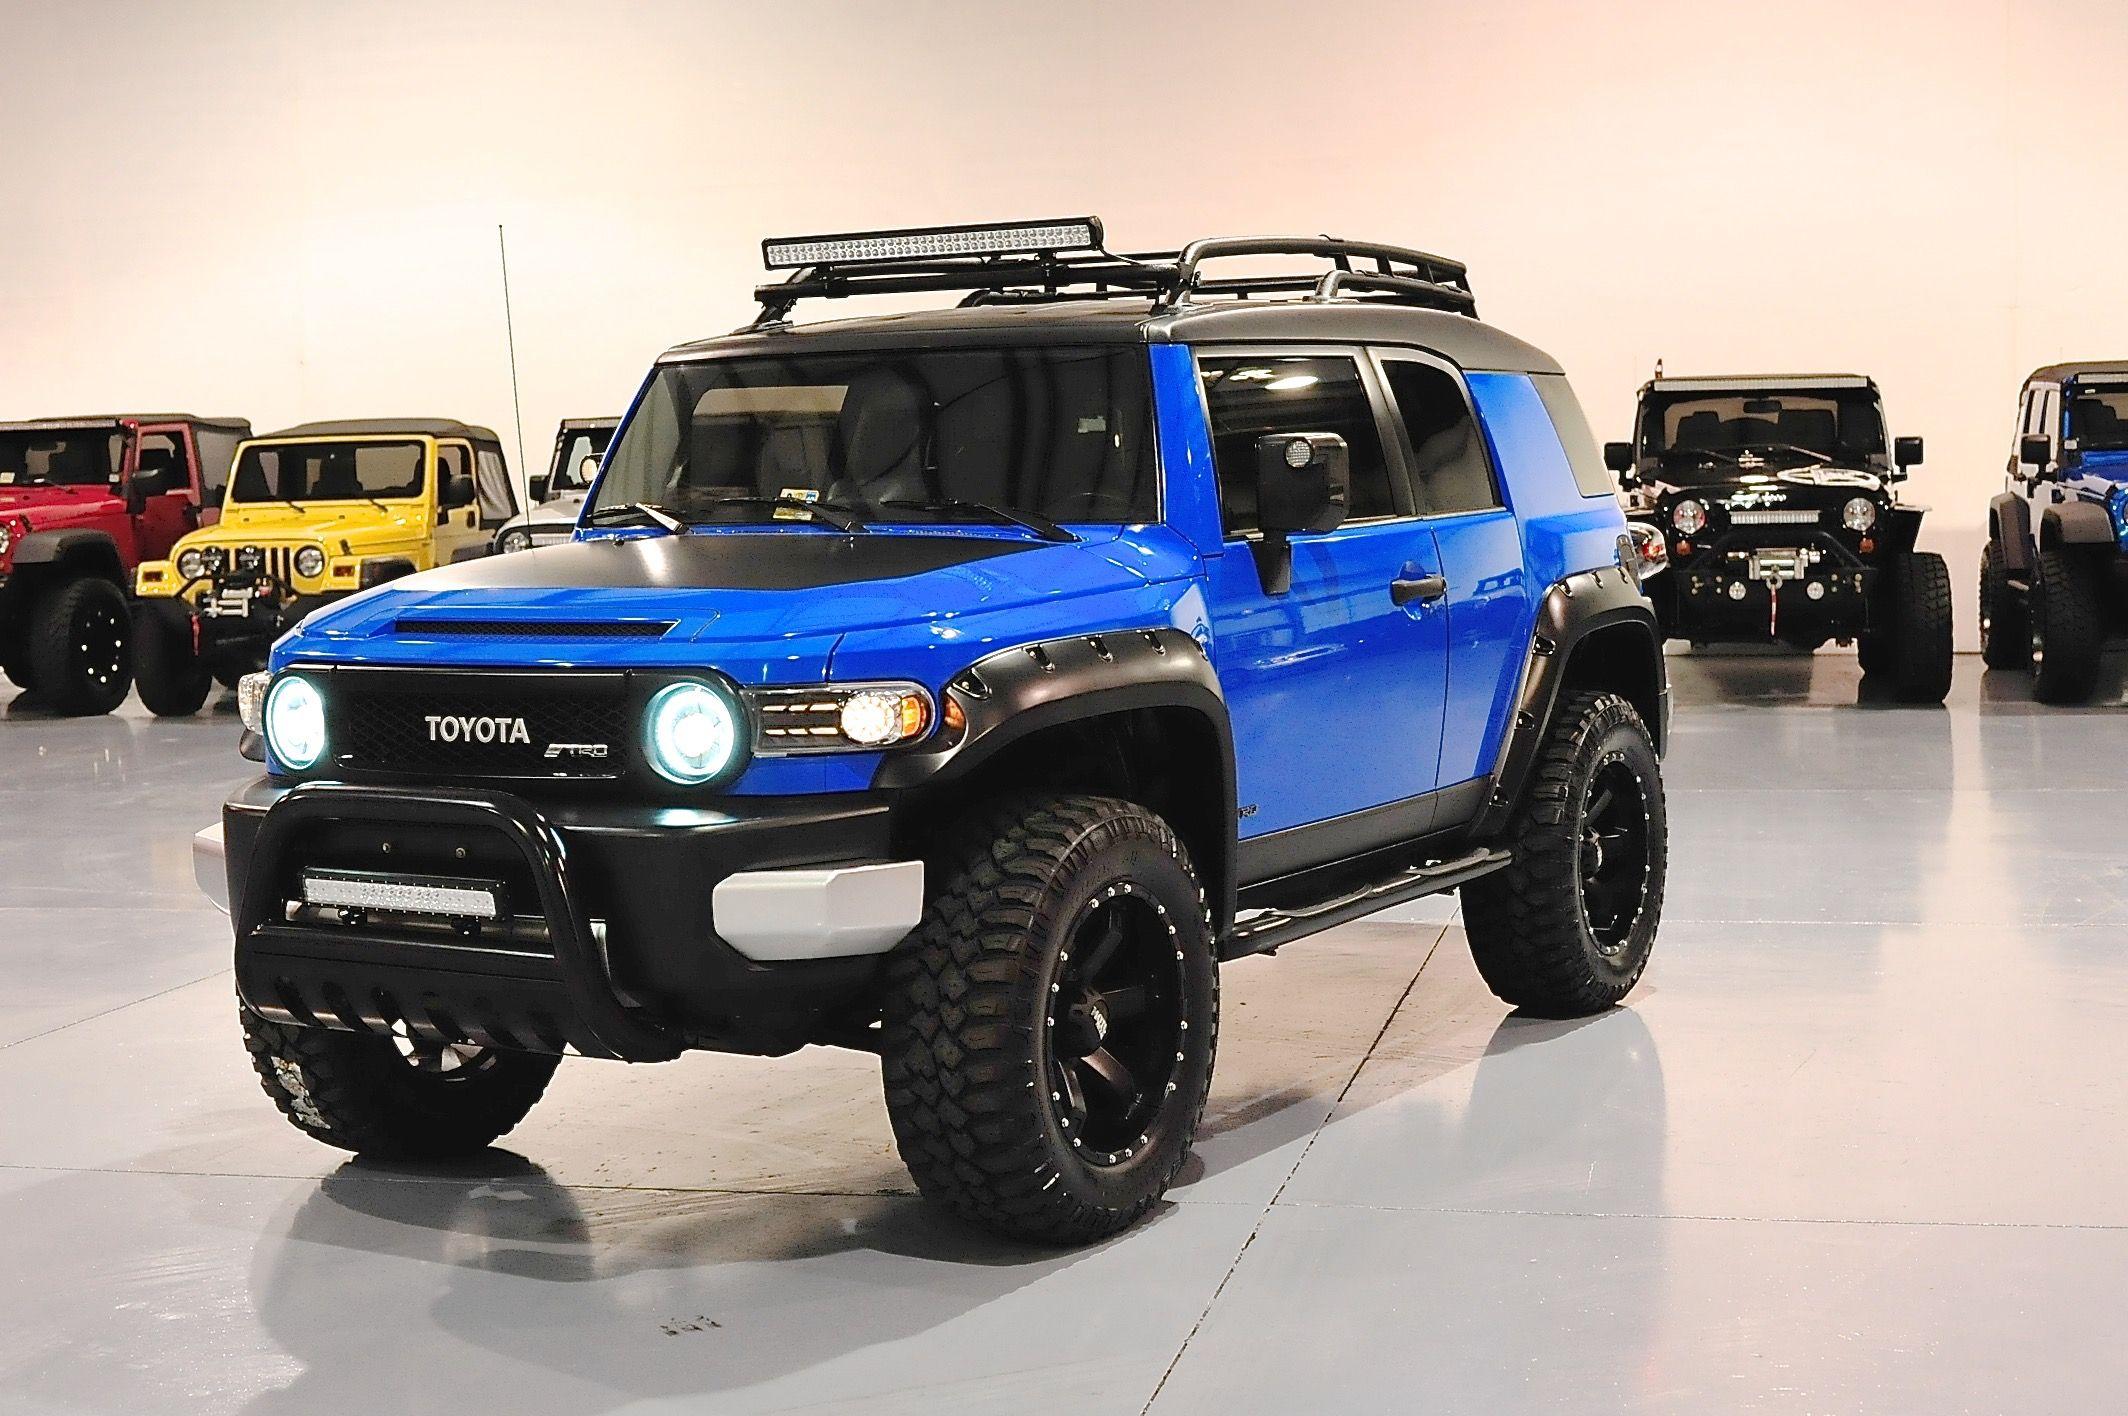 Fj Blue 1 Davis Autosports In 2020 Toyota Fj Cruiser Lifted Jeep Cherokee Fj Cruiser Accessories